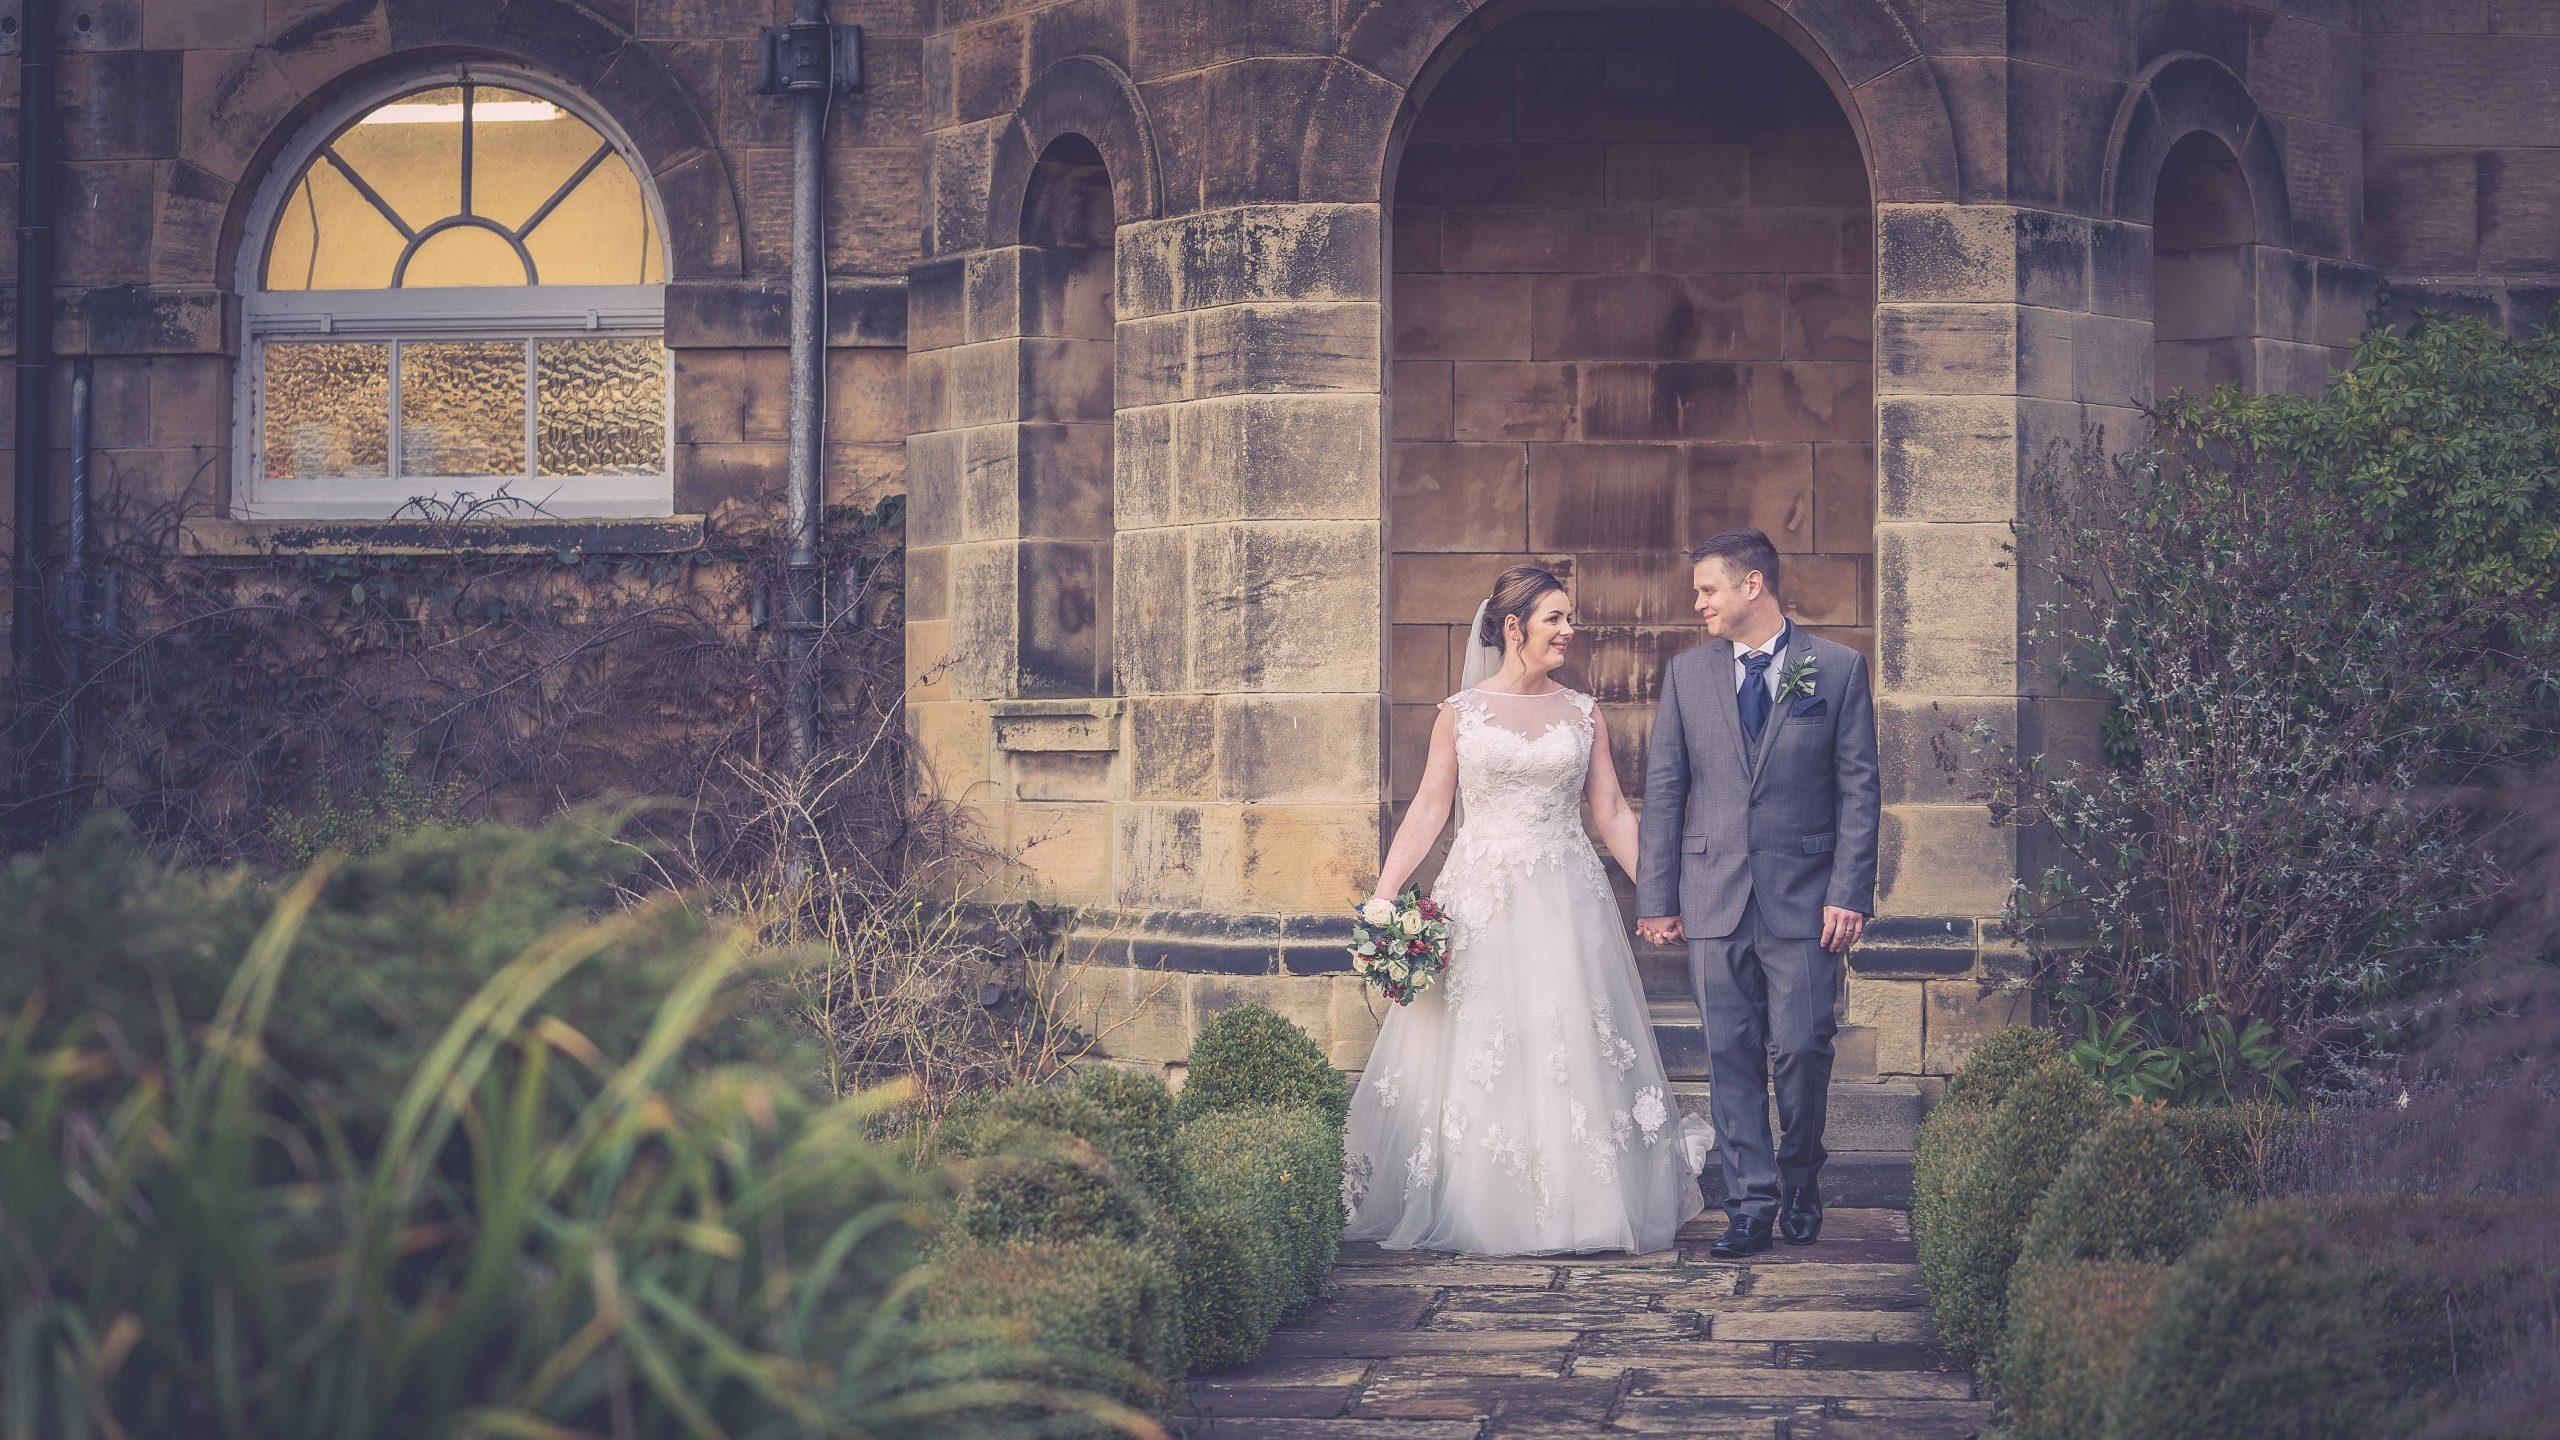 Award winning wedding photography at Crathorne Hall